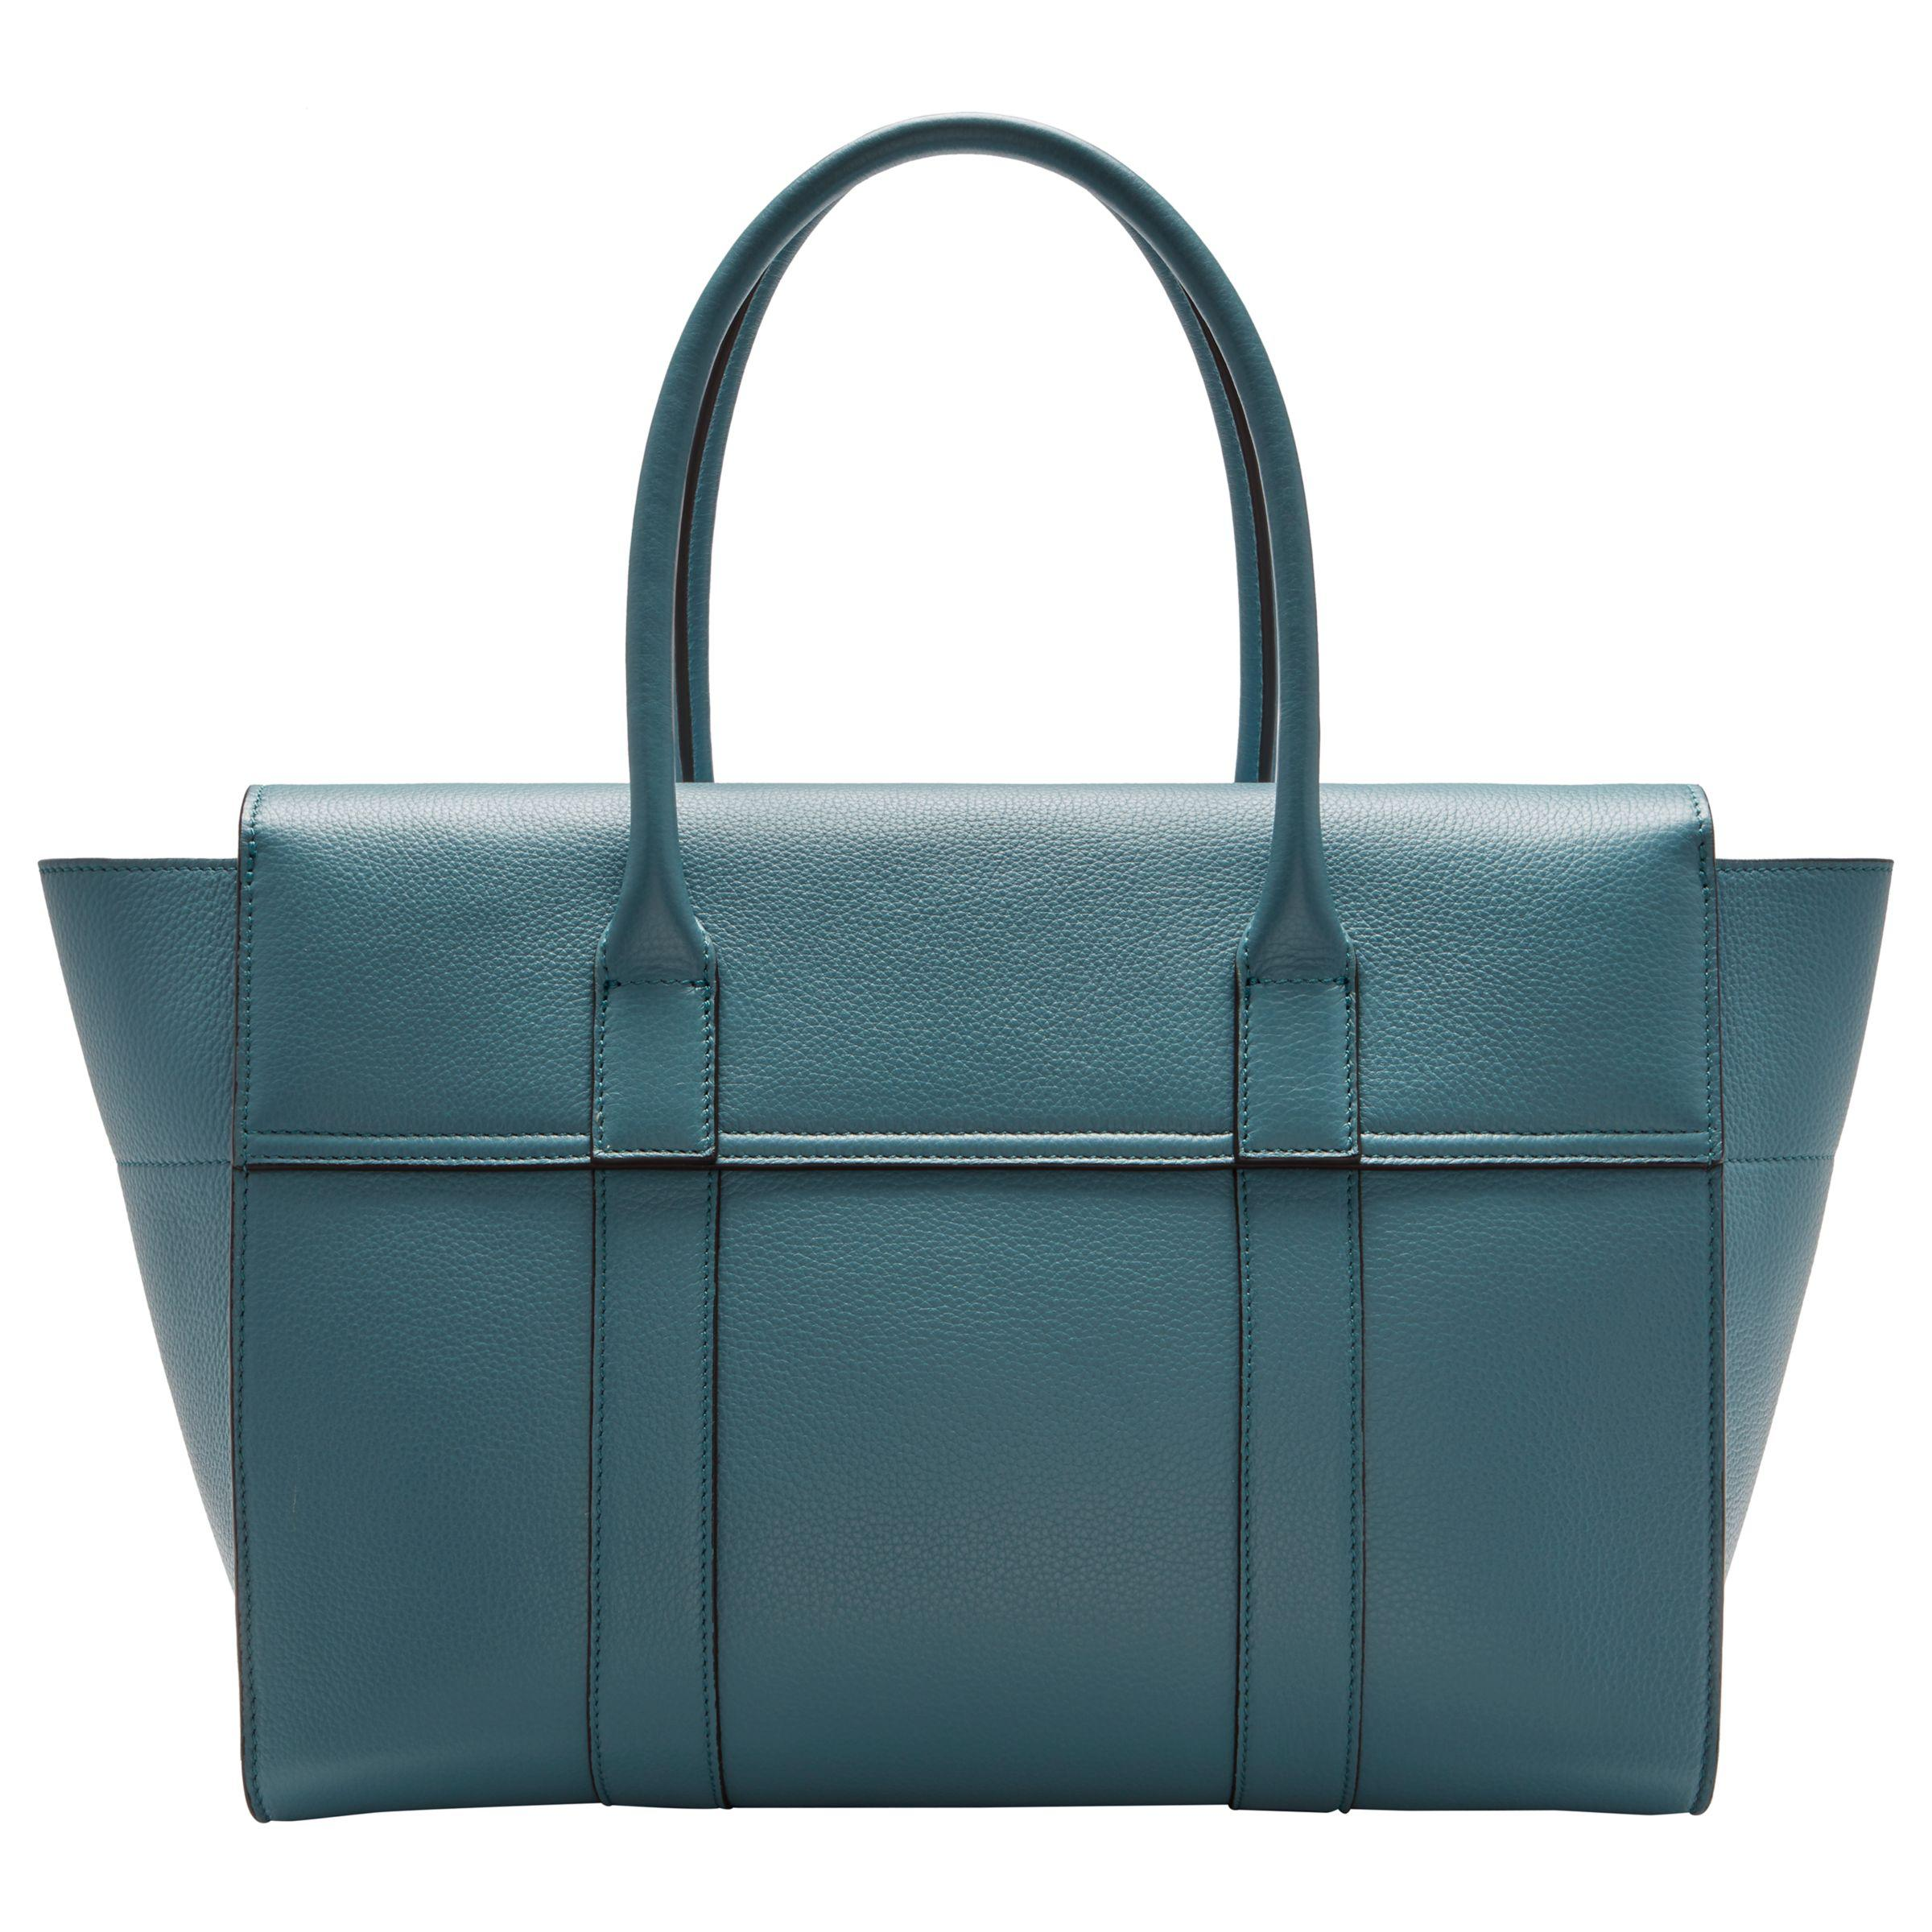 7e2336b528f2 John Lewis Mulberry Bayswater Grain Veg Tan Leather Bag in Blue - Lyst